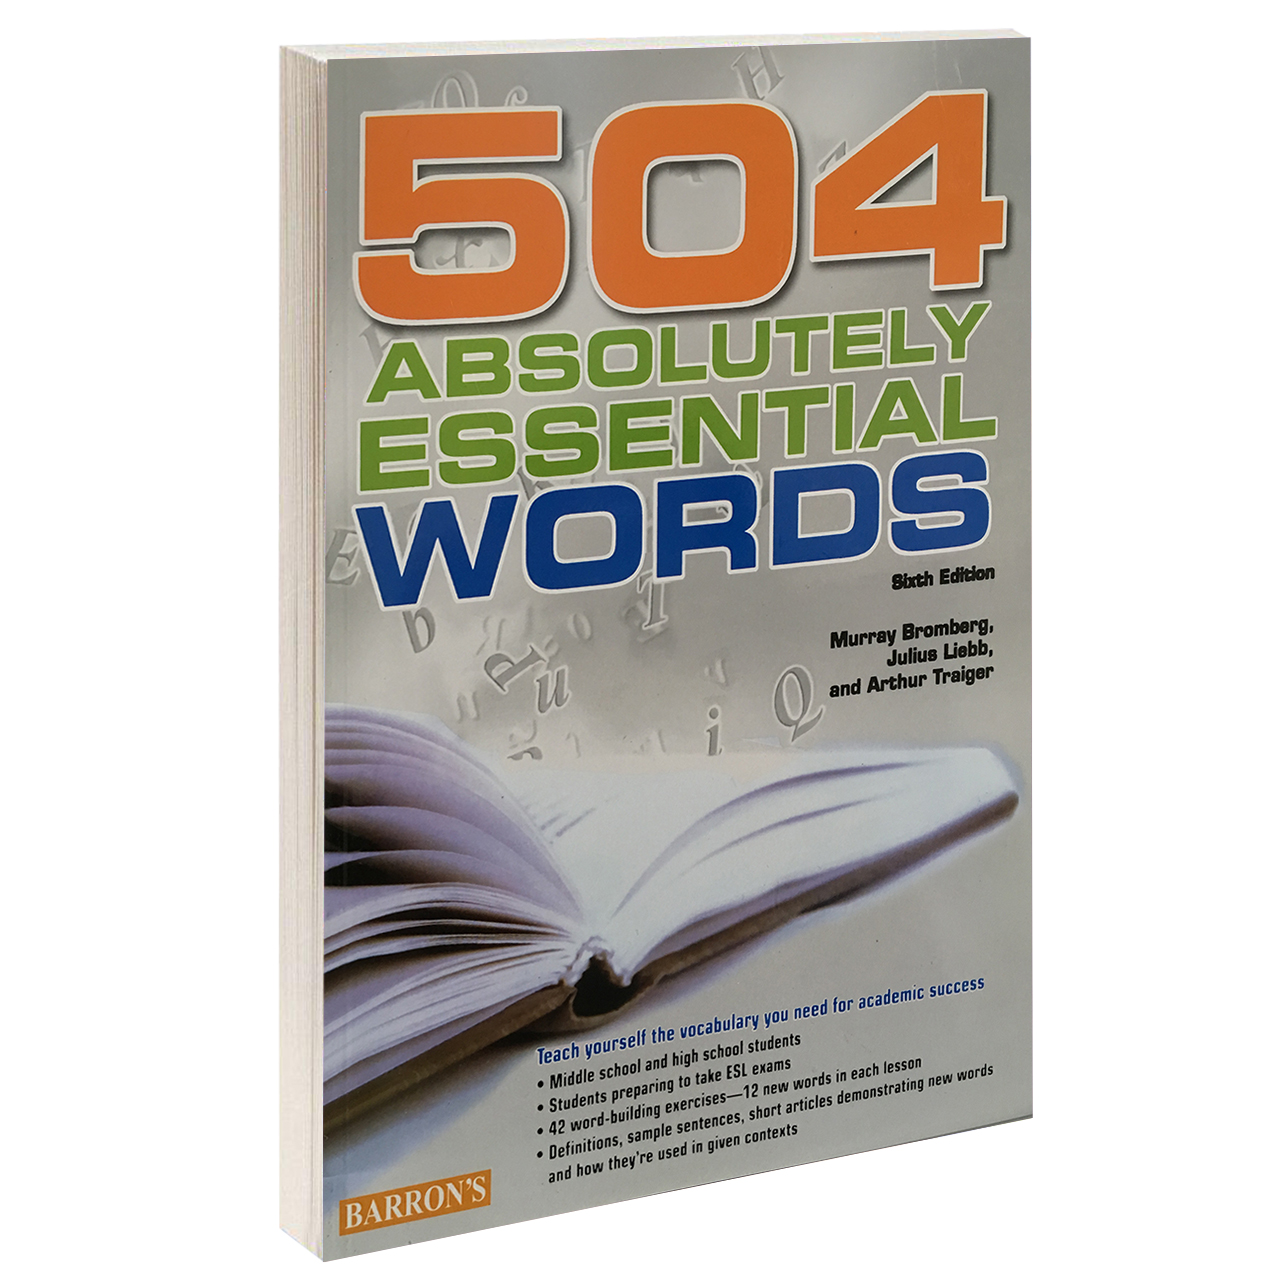 خرید                      کتاب 504 Absolutely Essential Words اثر Murray Bromberg انتشارات Oxford